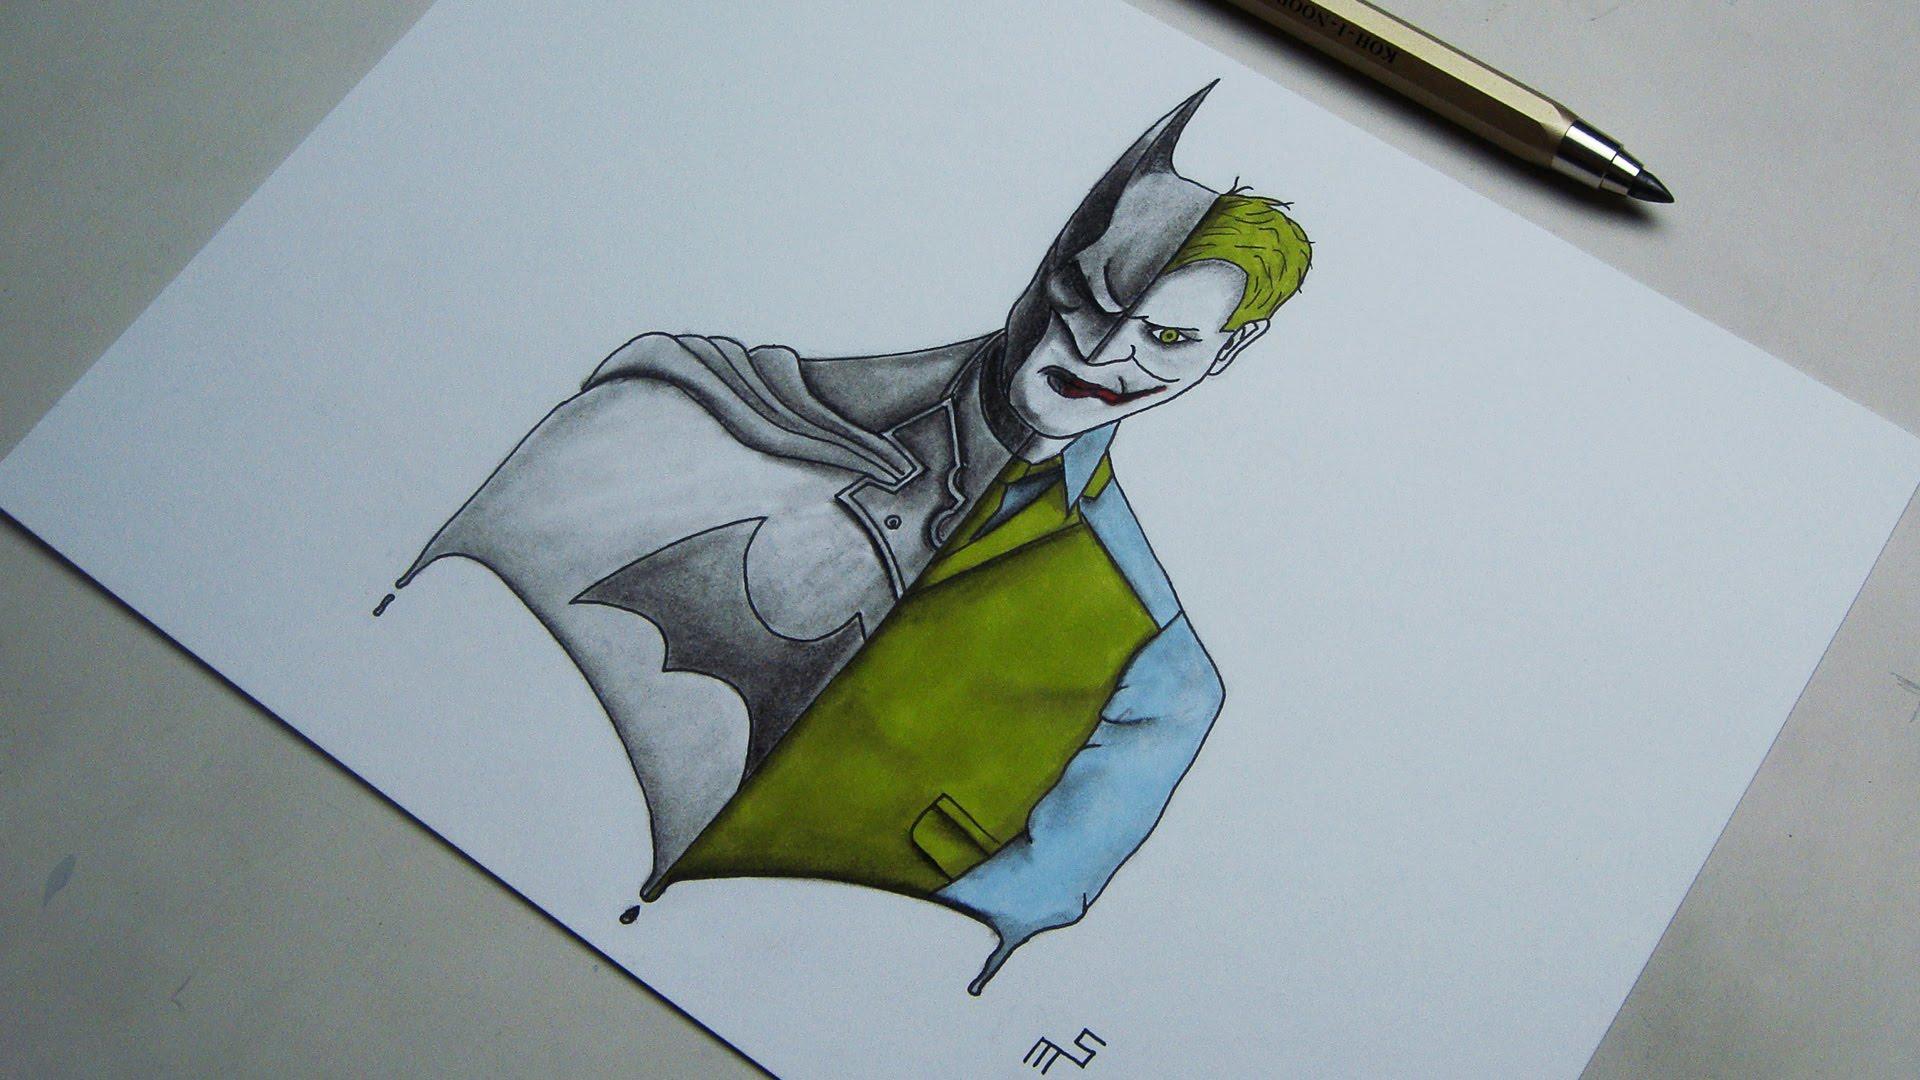 1920x1080 Speed Drawing Batman Vs Joker Artwork